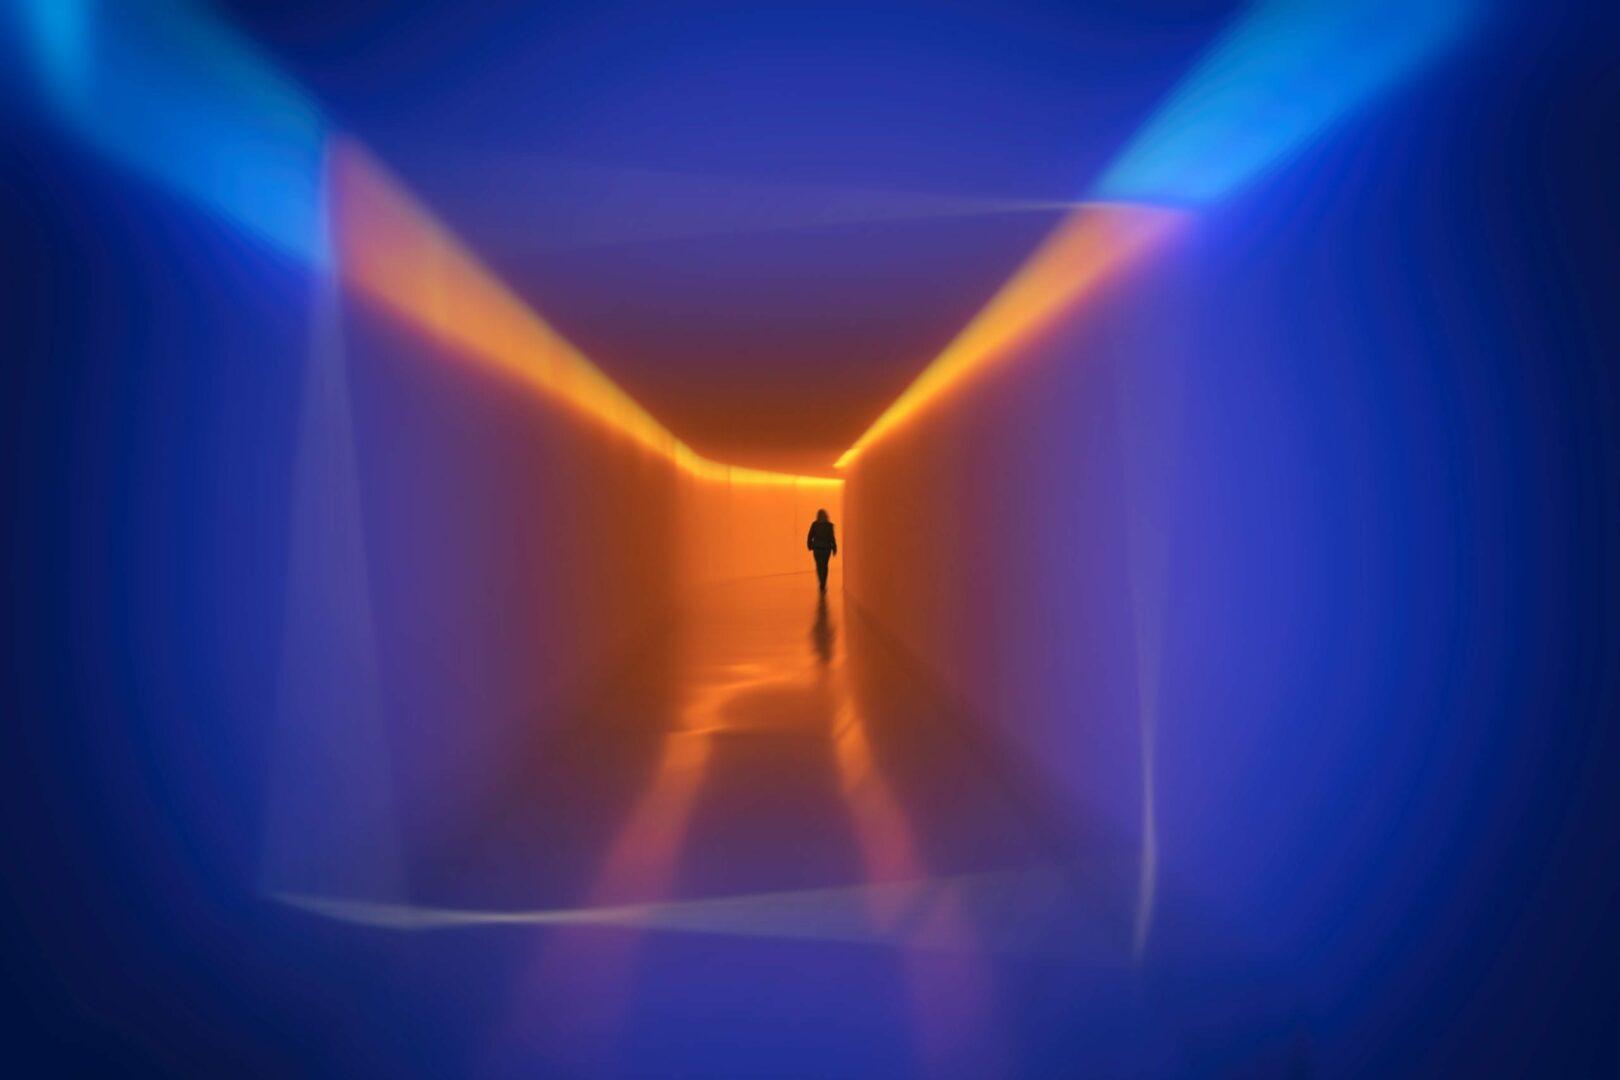 Man walking in blue and orange corridor